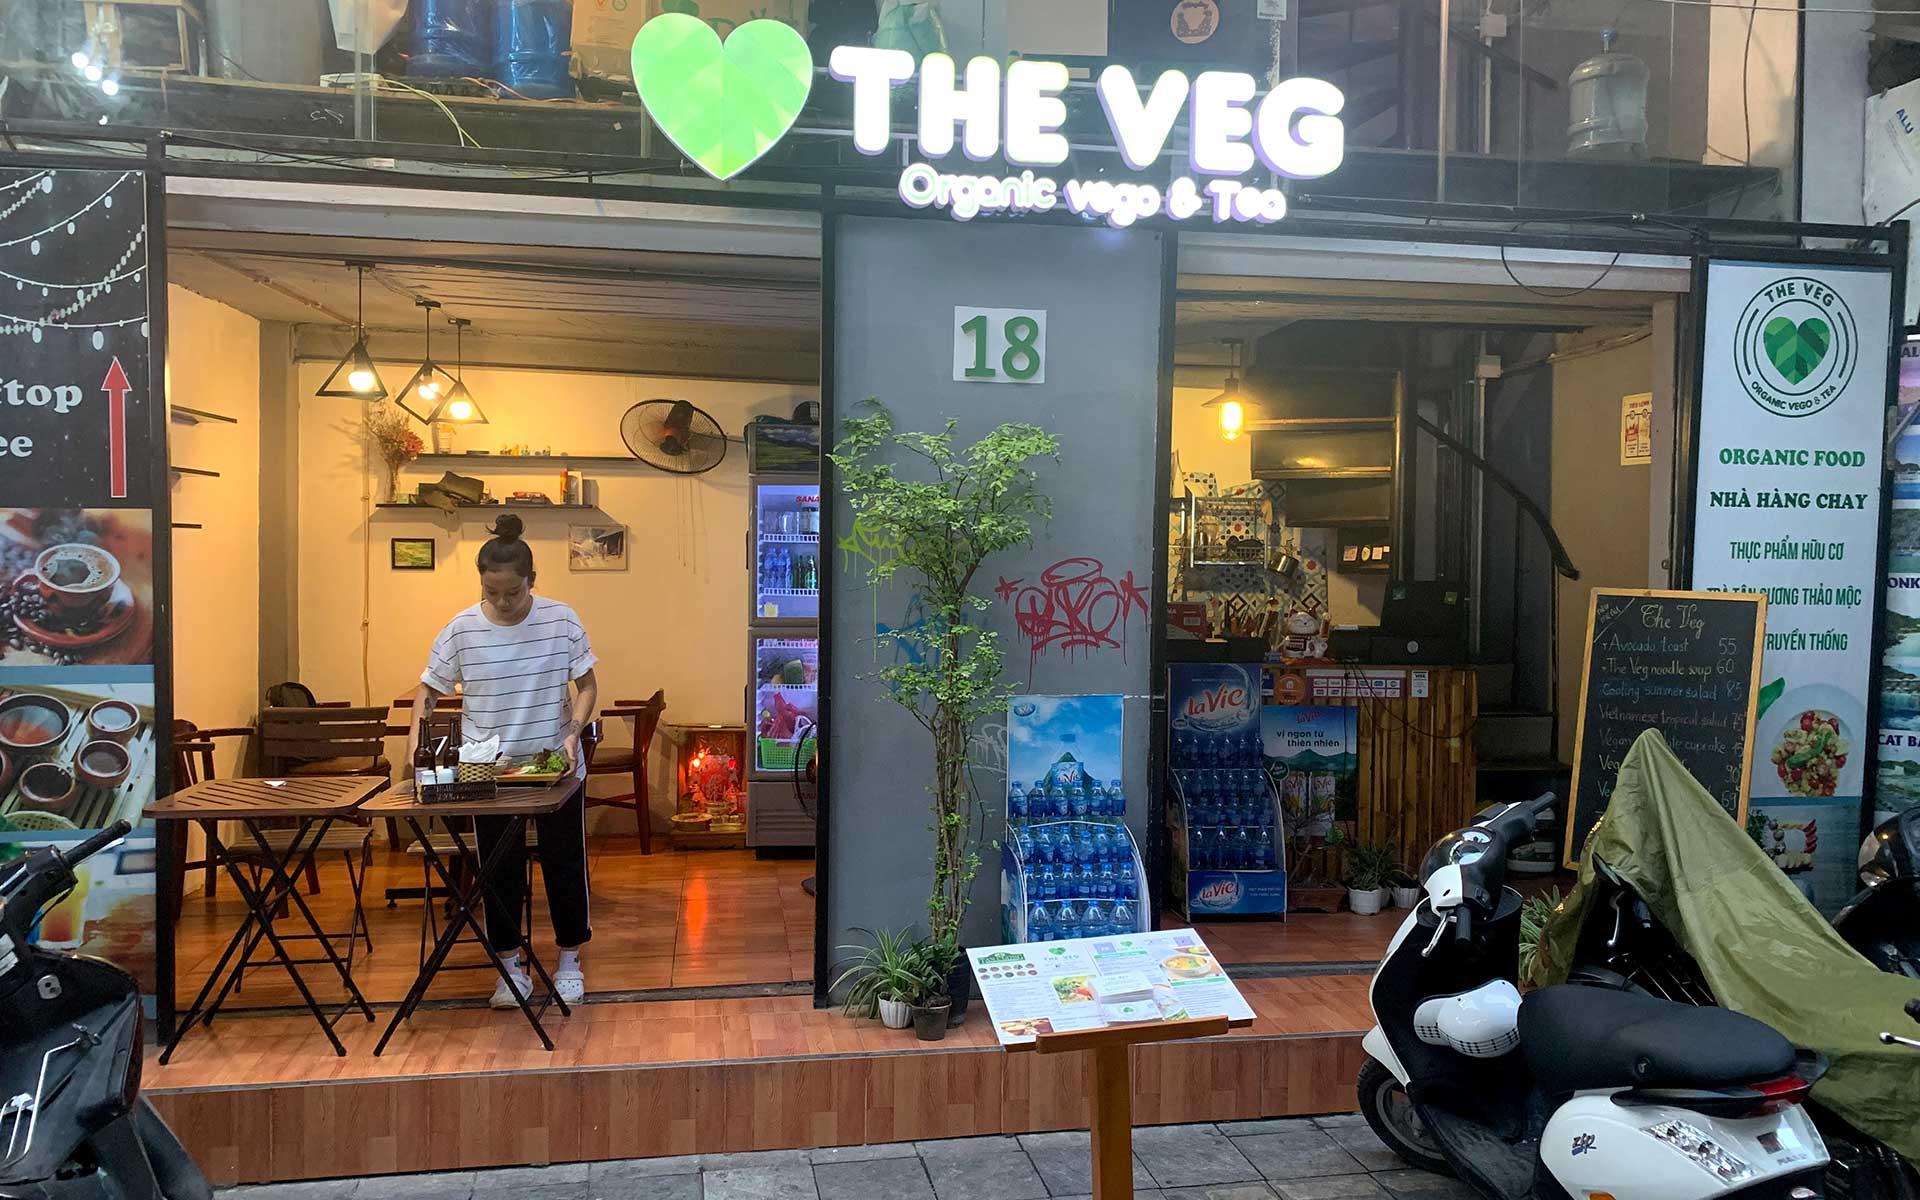 Clean venue & green meals at The Veg - Organic Vego & Tea